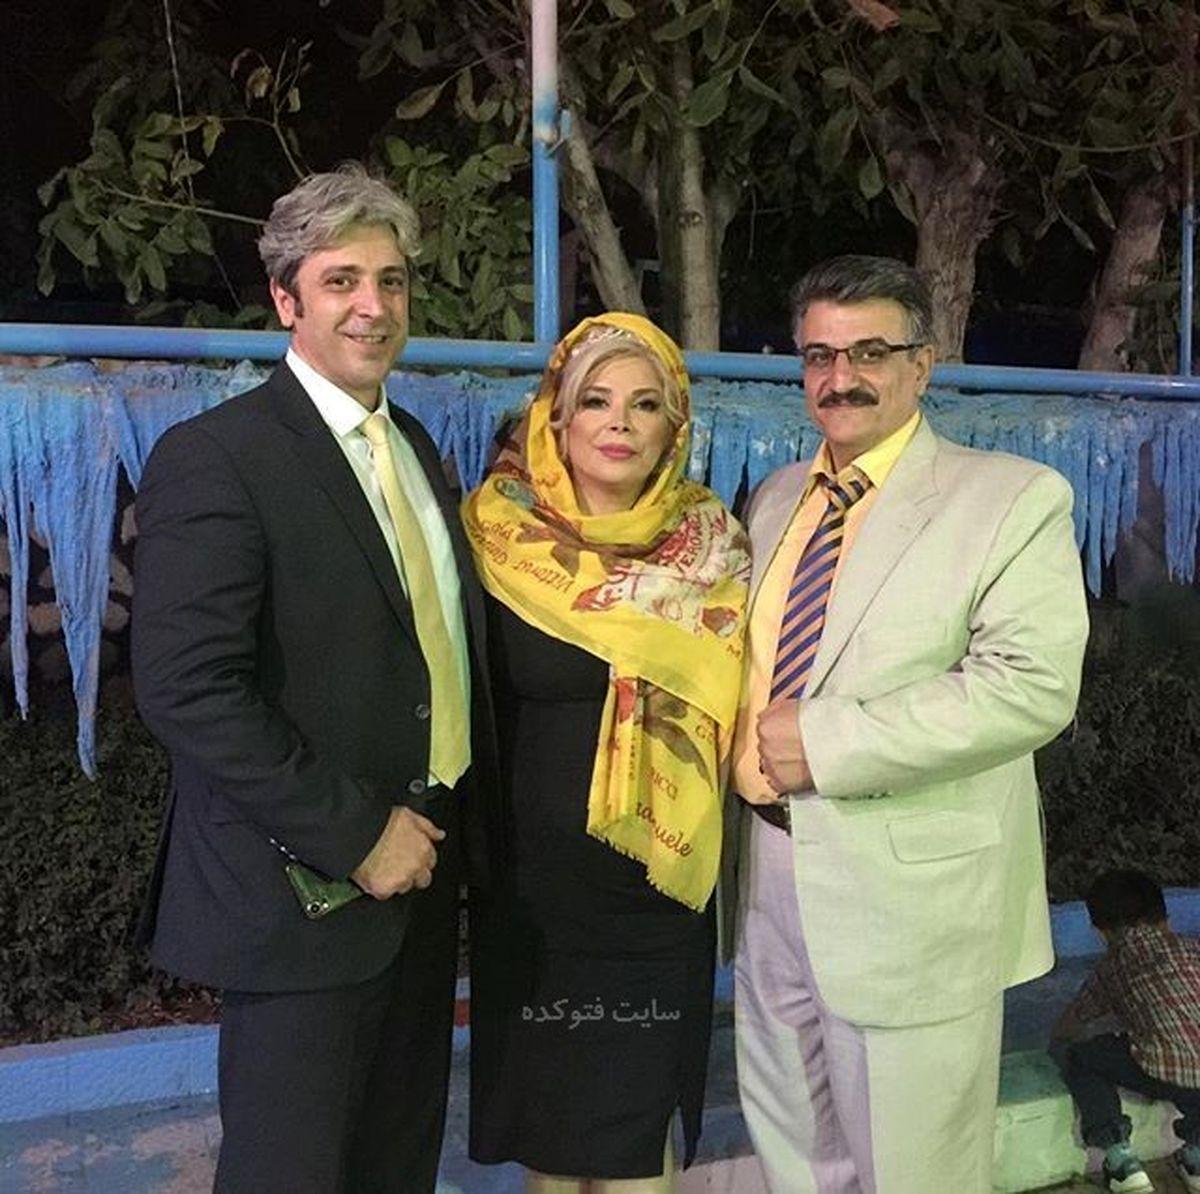 شیوا خنیاگر کنار همسر جوانش + عکس